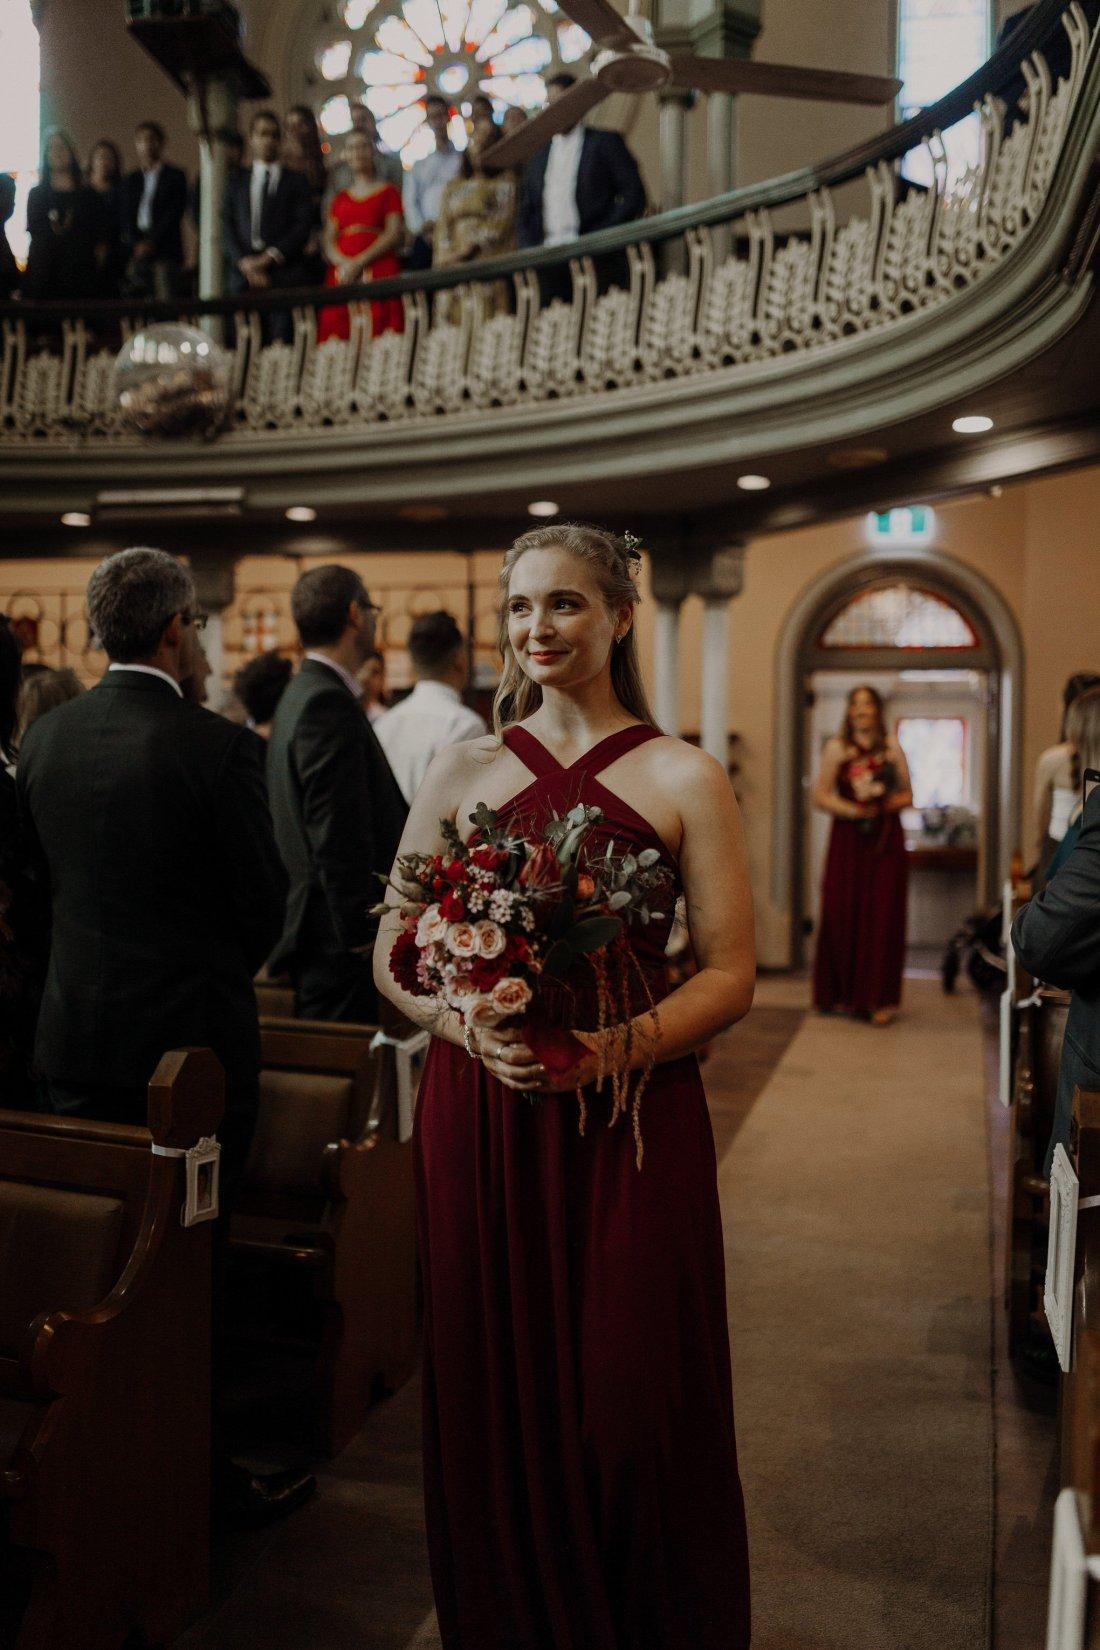 Ebony Blush Photography | Perth Wedding Photographer | Photography + Film | Sandalford Winery | Como Treasury Wedding | Perth City Wedding |Alex + Mel15